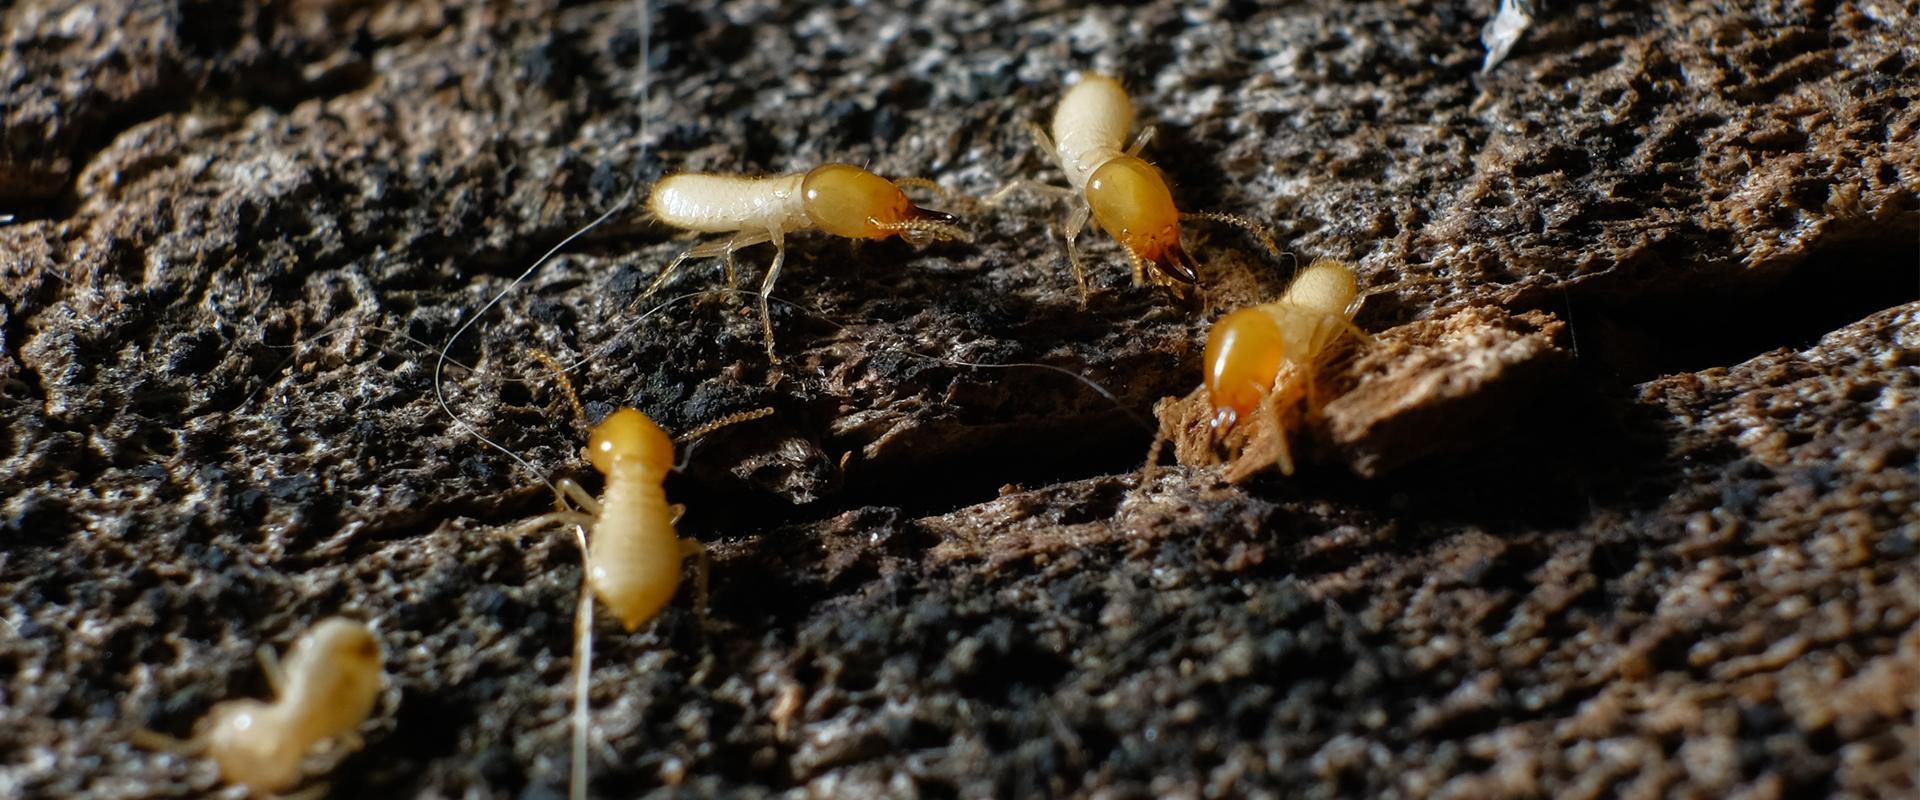 termite on dirt